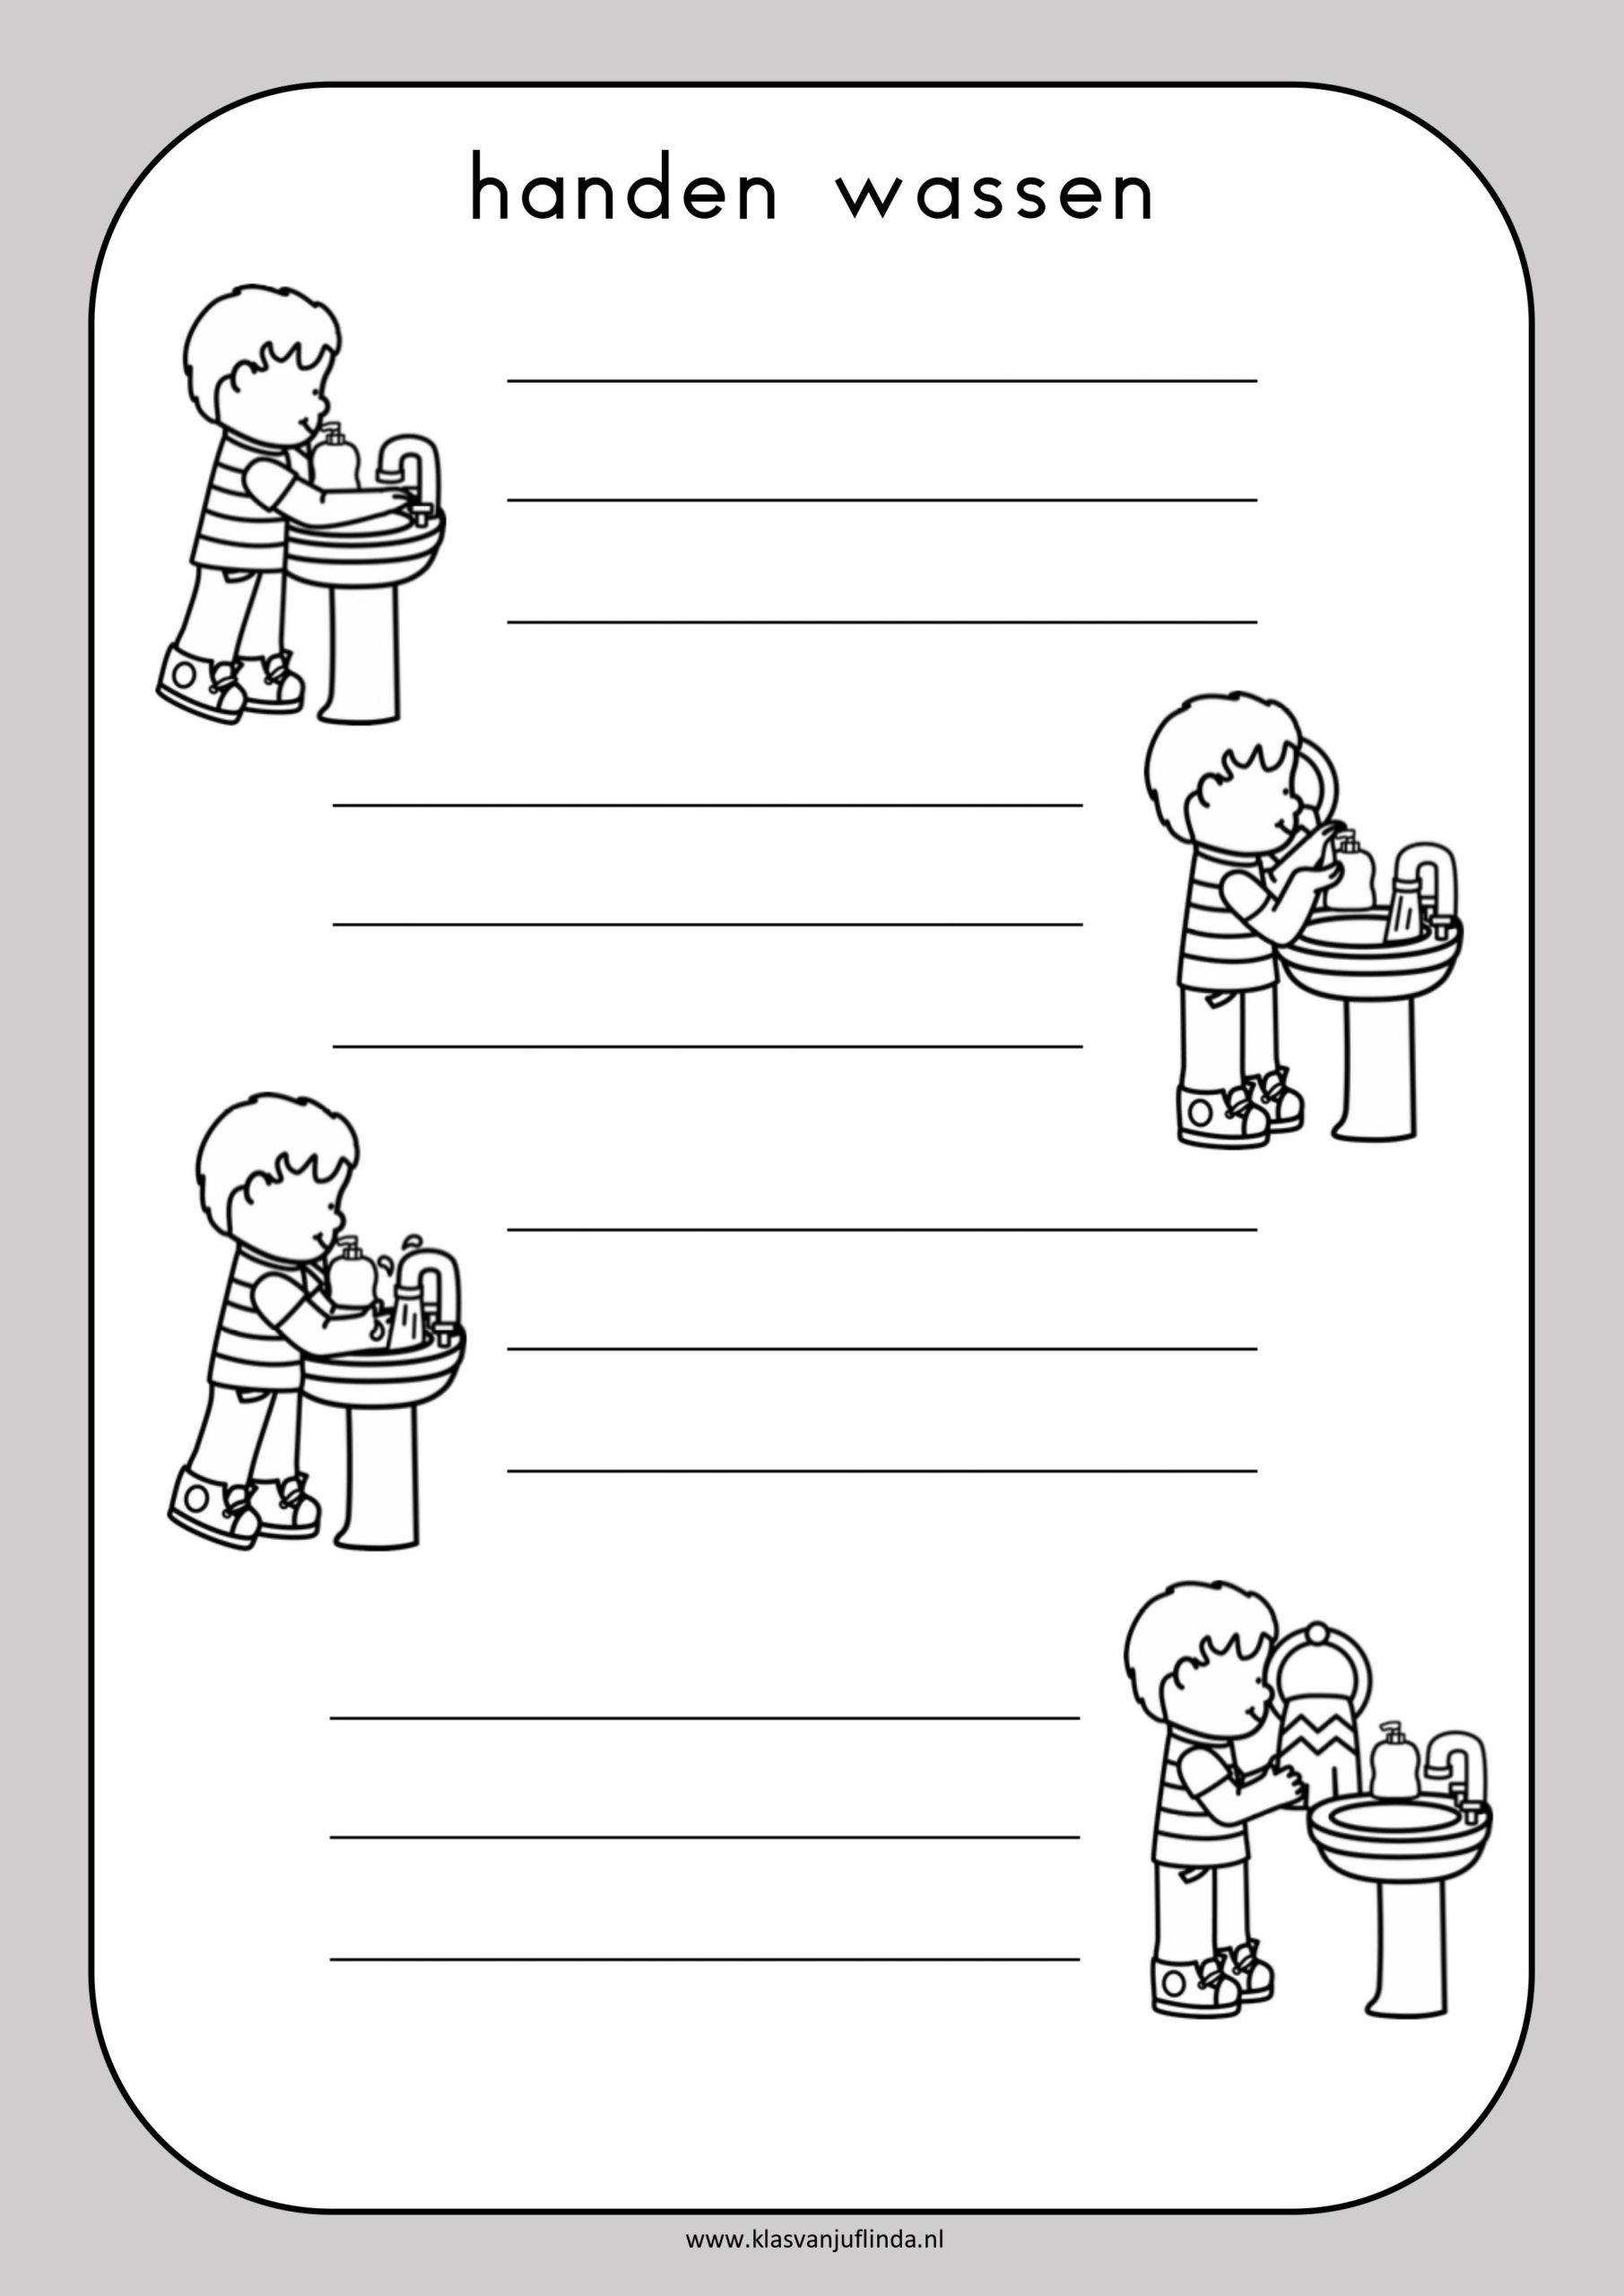 Stappenplan schrijven: handen wassen